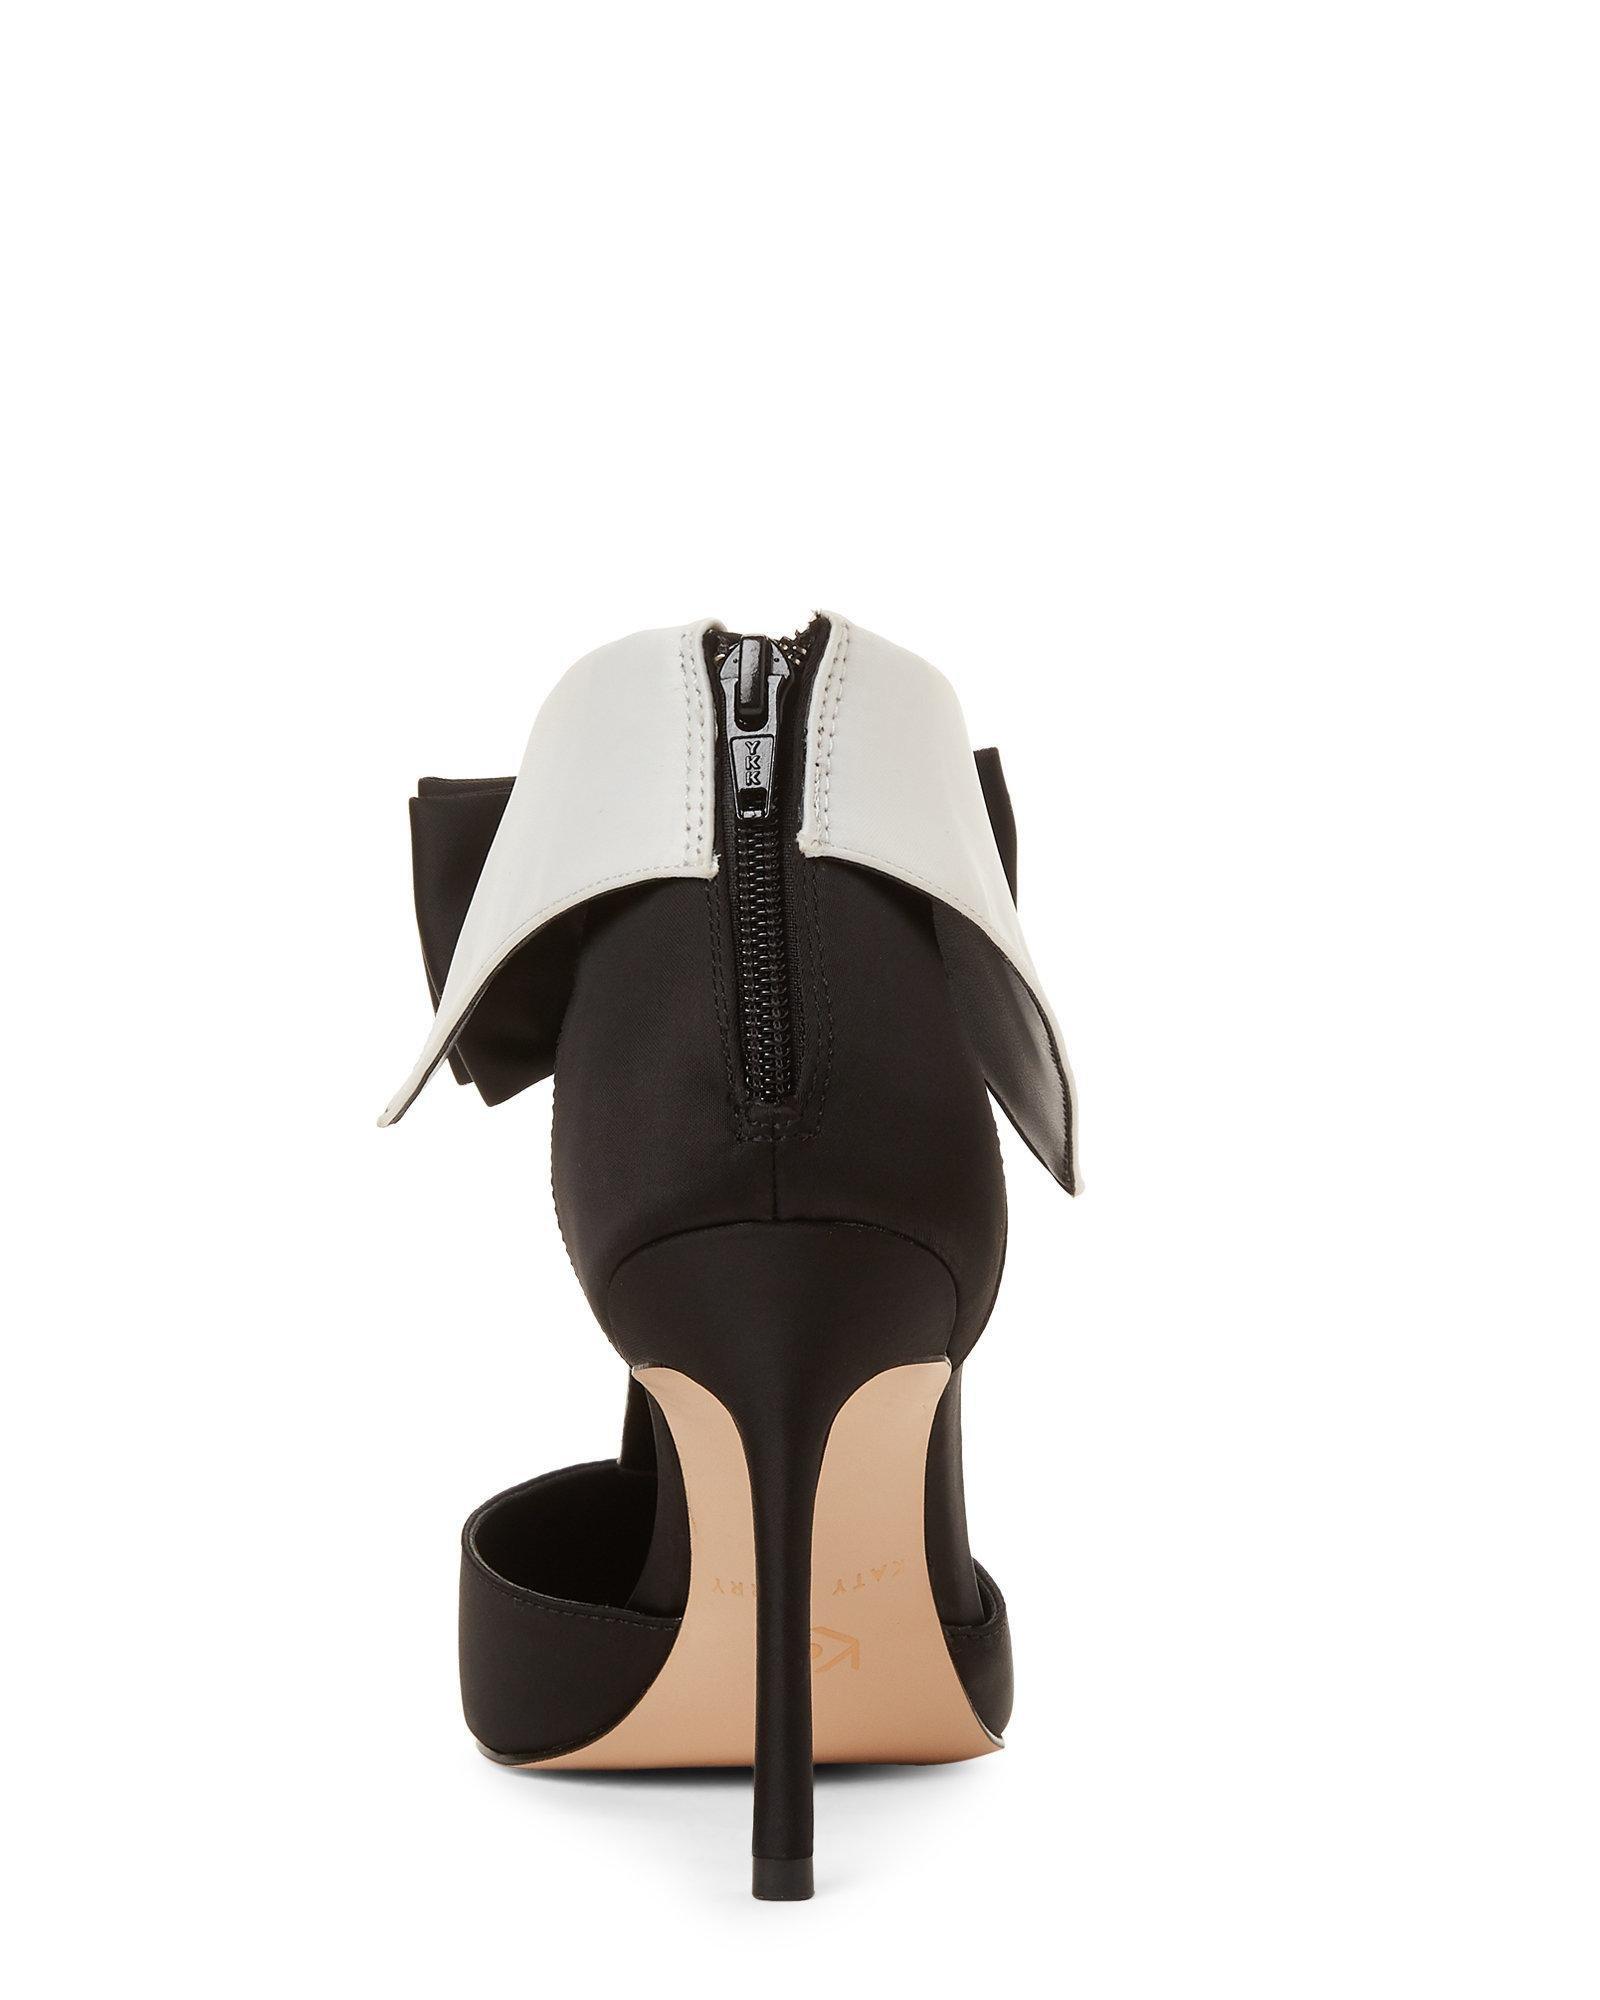 6b9112b3030 Lyst - Katy Perry The Adella Satin Stiletto Pumps in Black